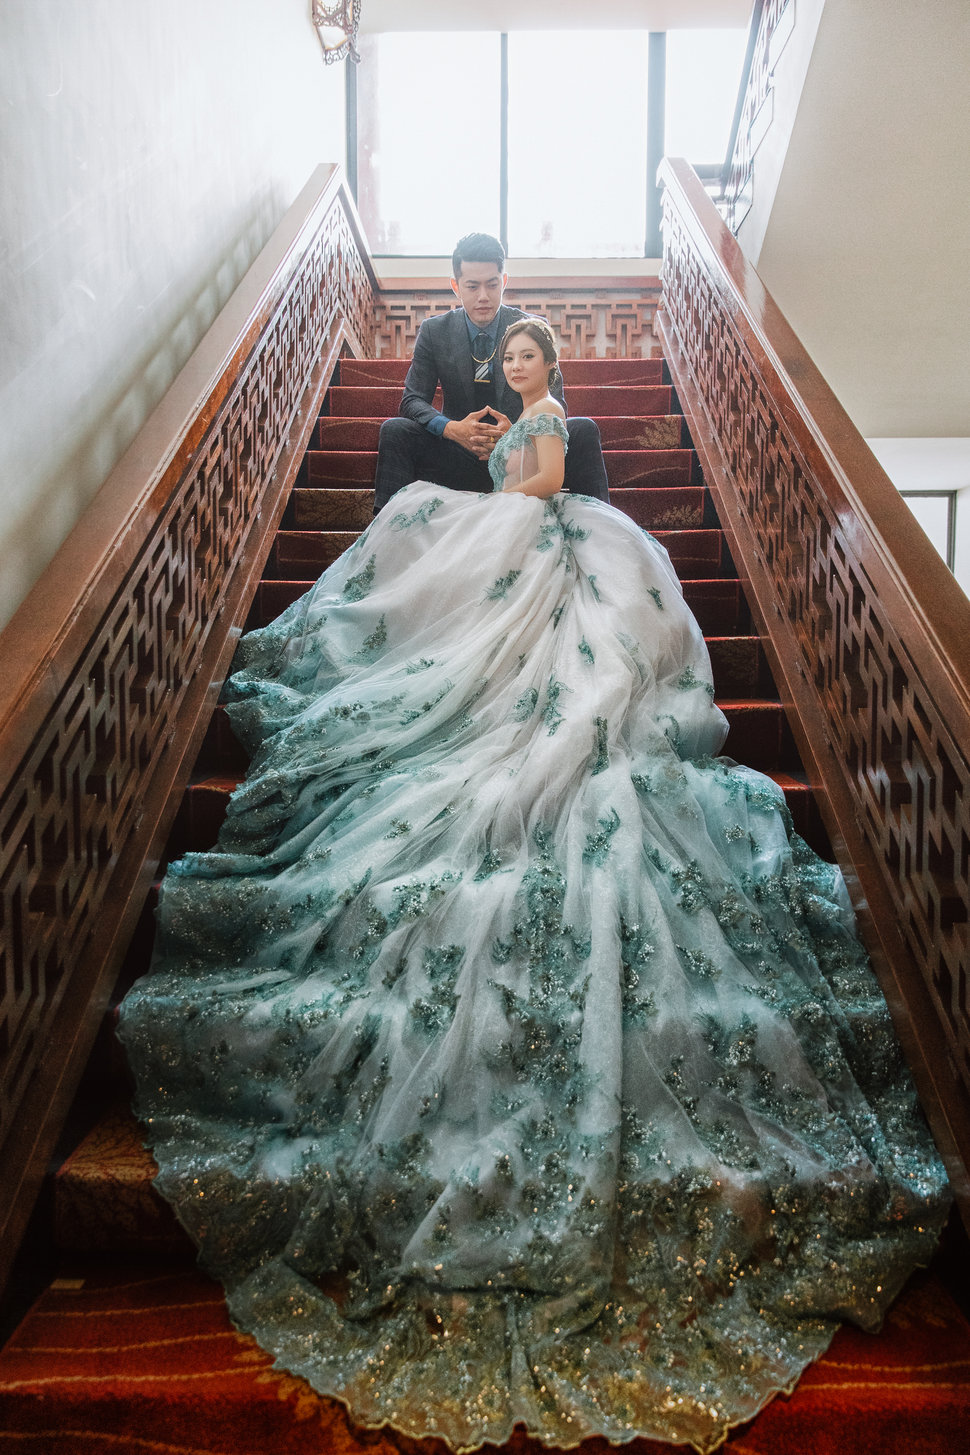 20190914-20190914-QUAN4497-編輯 - QUAN  婚禮紀錄 / 影像工作室《結婚吧》